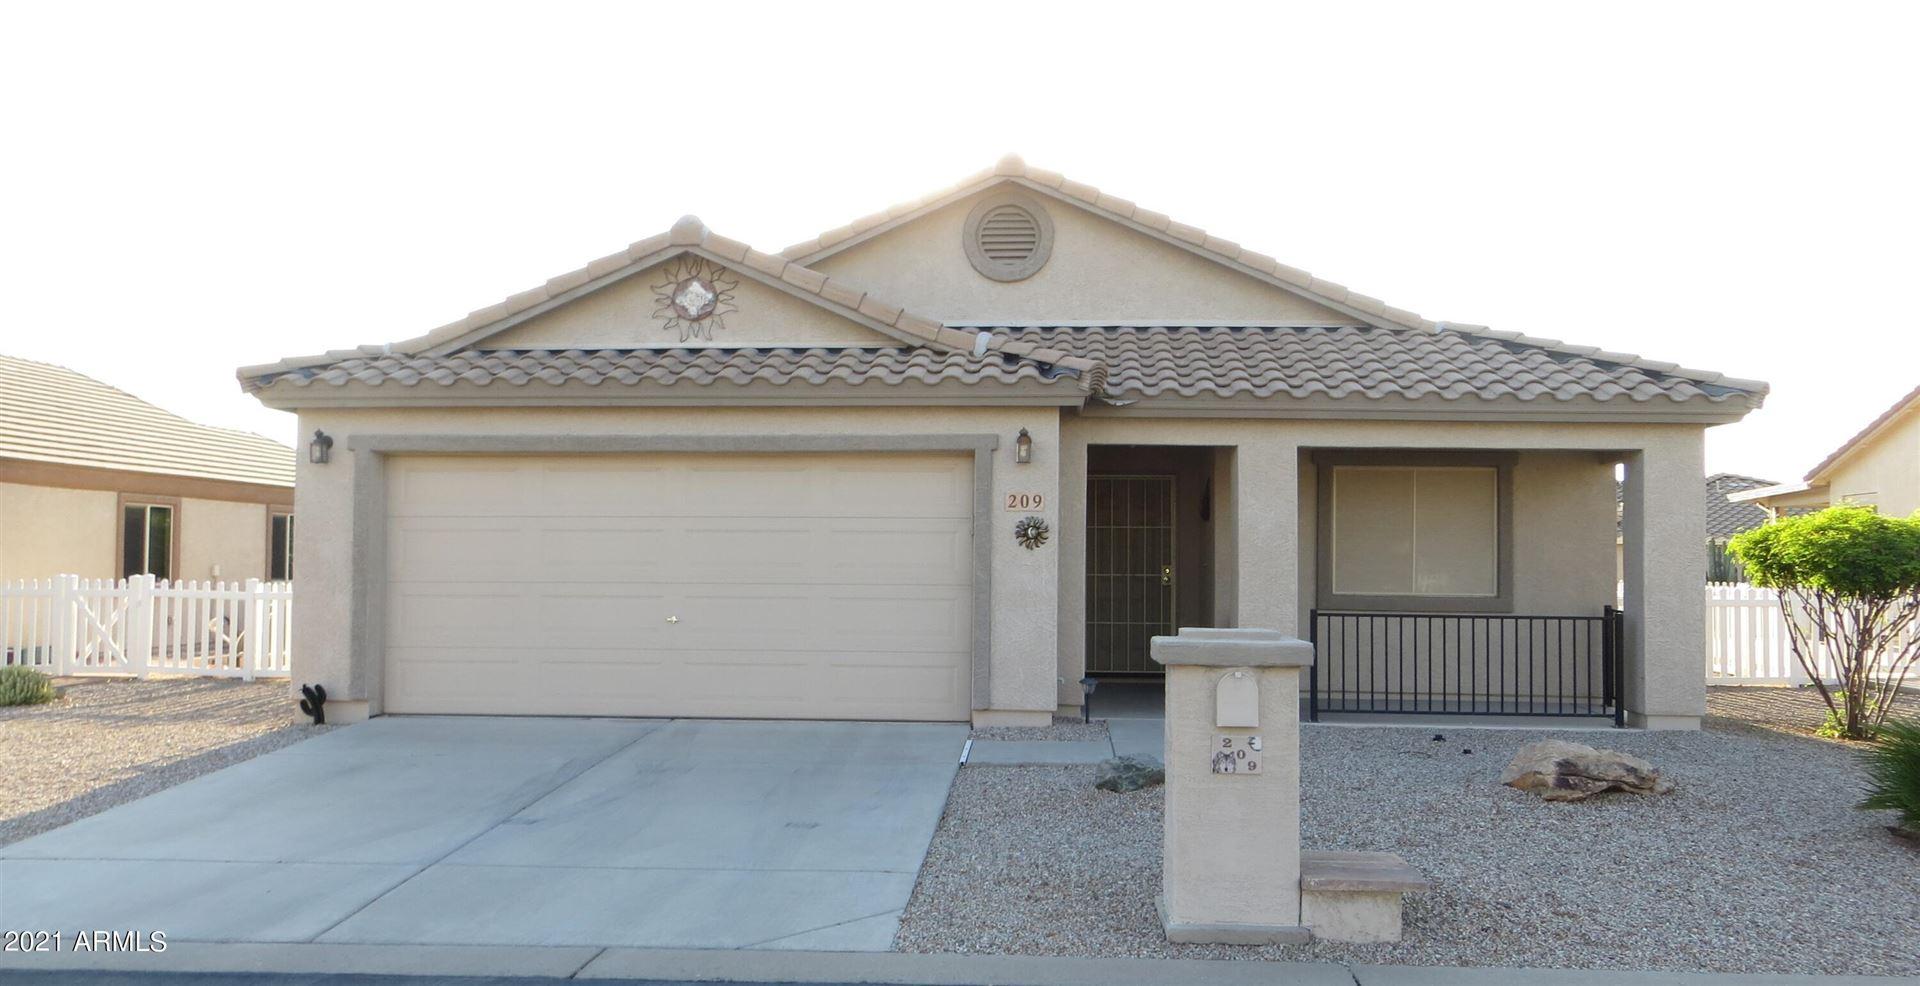 Photo of 2101 S MERIDIAN Road #209, Apache Junction, AZ 85120 (MLS # 6295565)